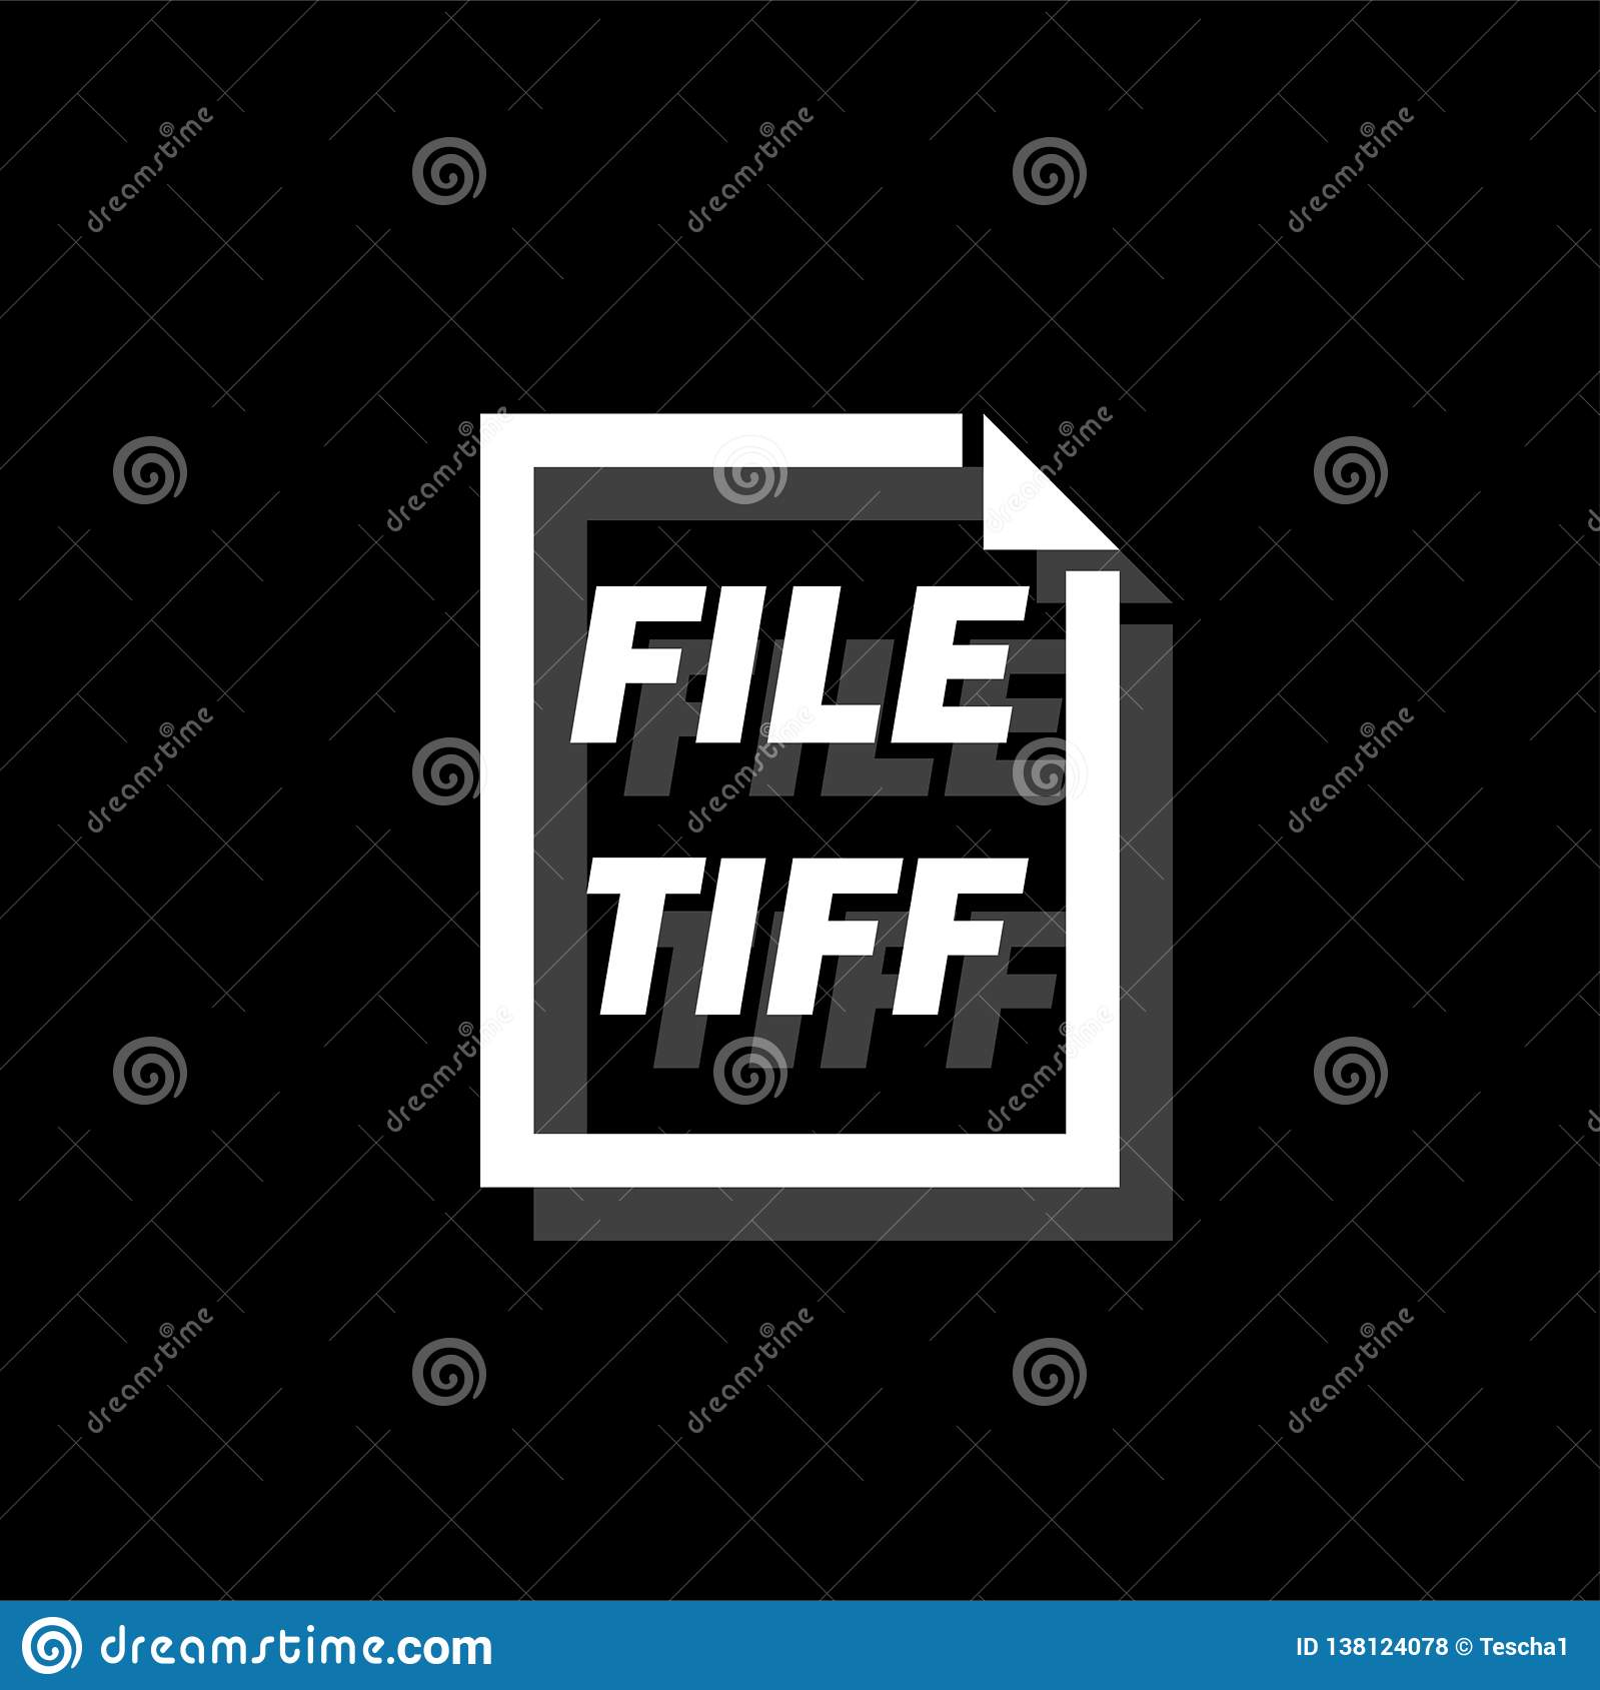 TIFF File icon flat